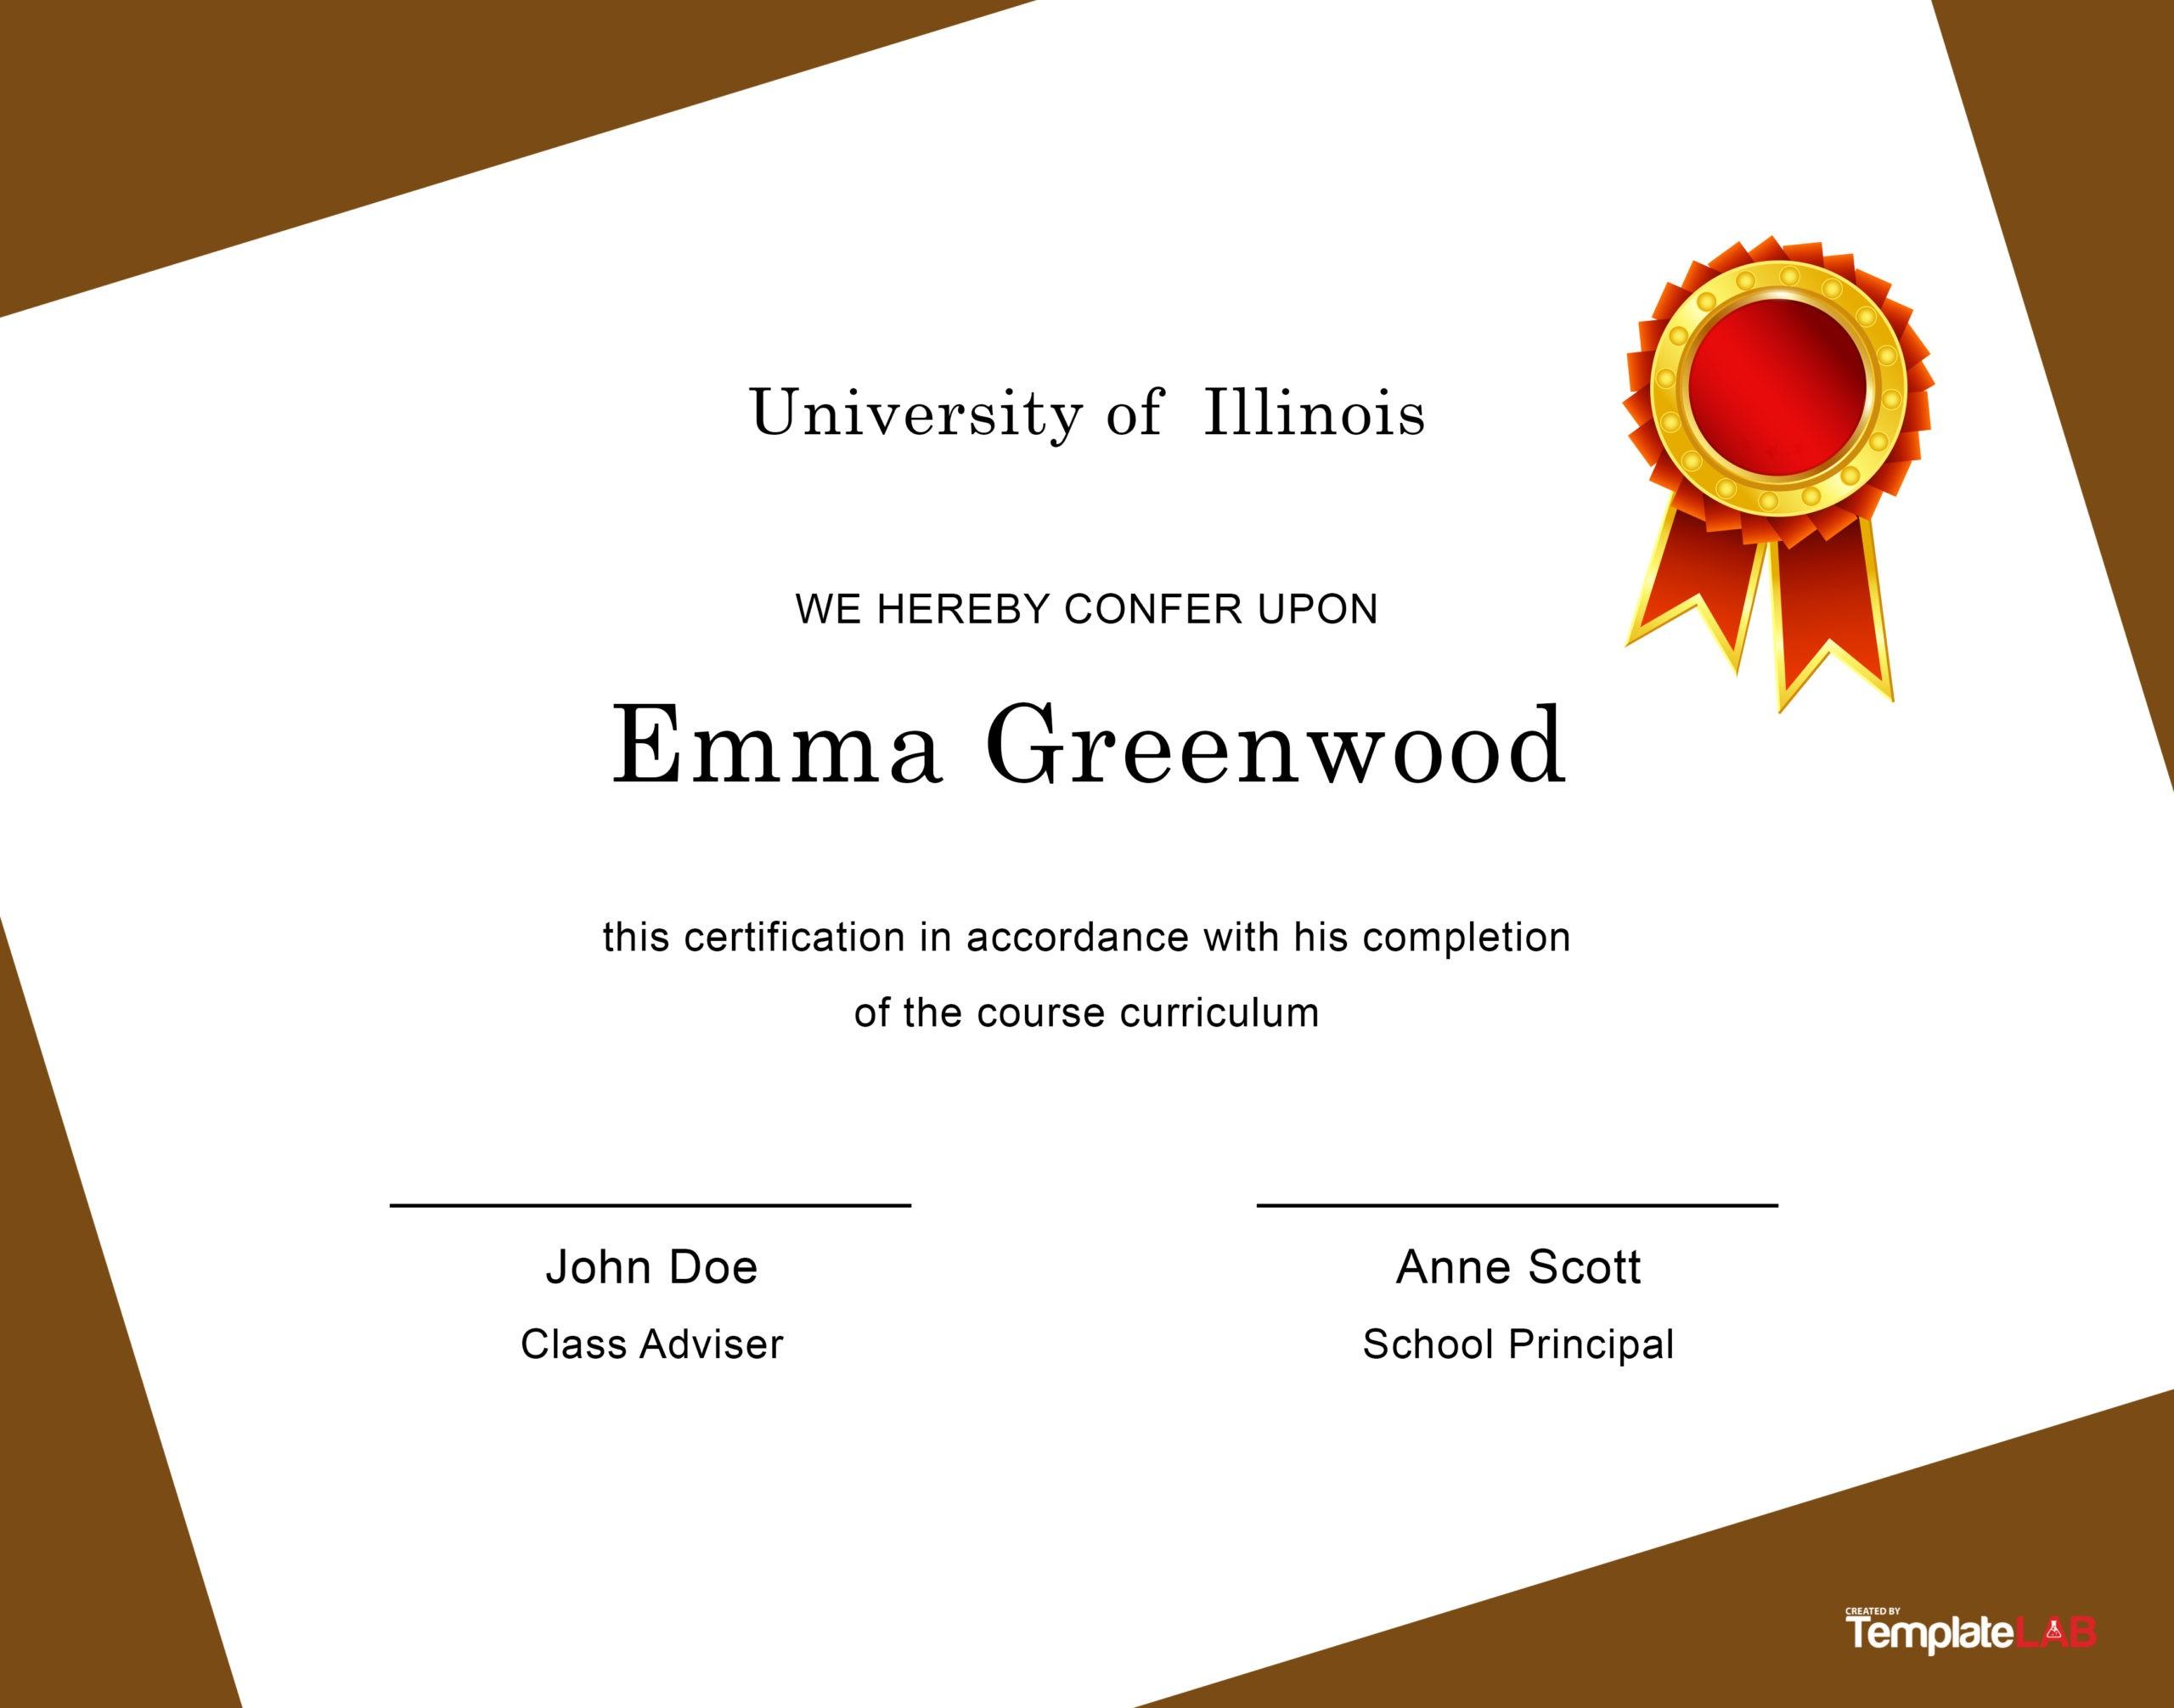 Free Diploma Template 4 - TemplateLab.com